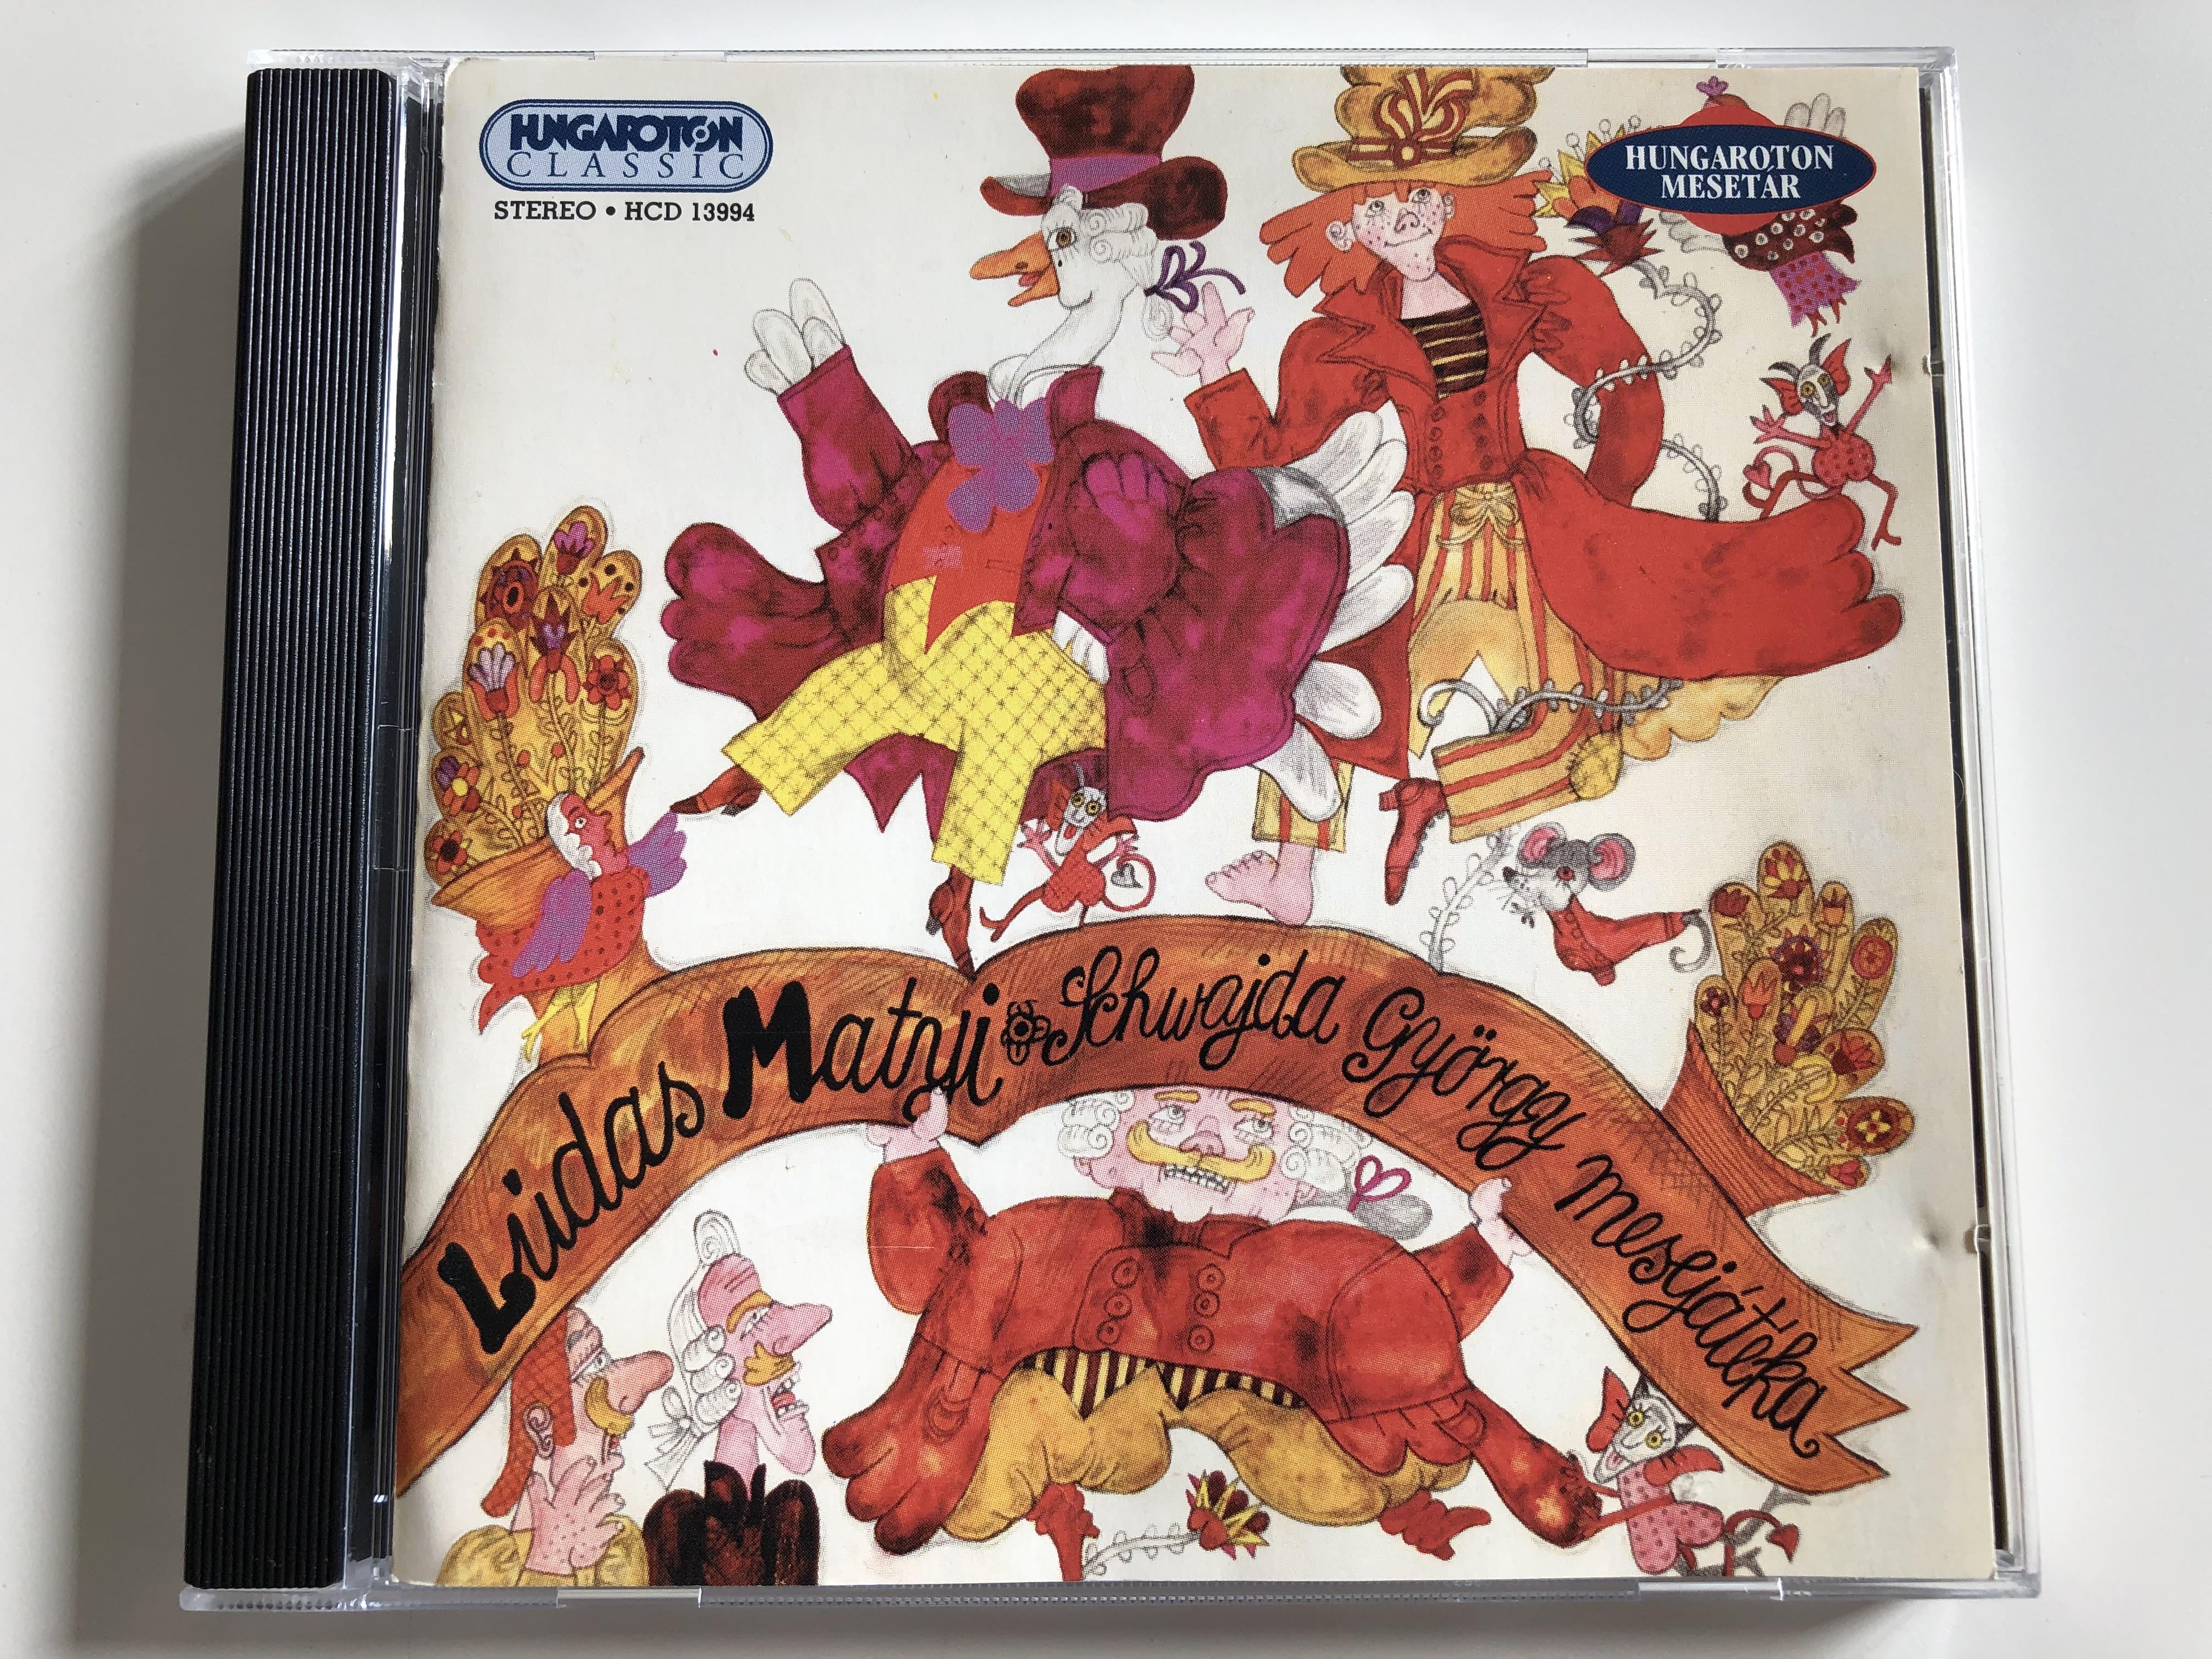 ludas-matyi-schwajda-gy-rgy-mesej-t-ka-hungarian-children-s-radioplay-written-by-mih-ly-fazekas-adapted-by-schwajda-gy-rgy-directed-by-magos-gy-rgy-hcd-13994-hungaroton-classic-audio-cd-2000-1-.jpg